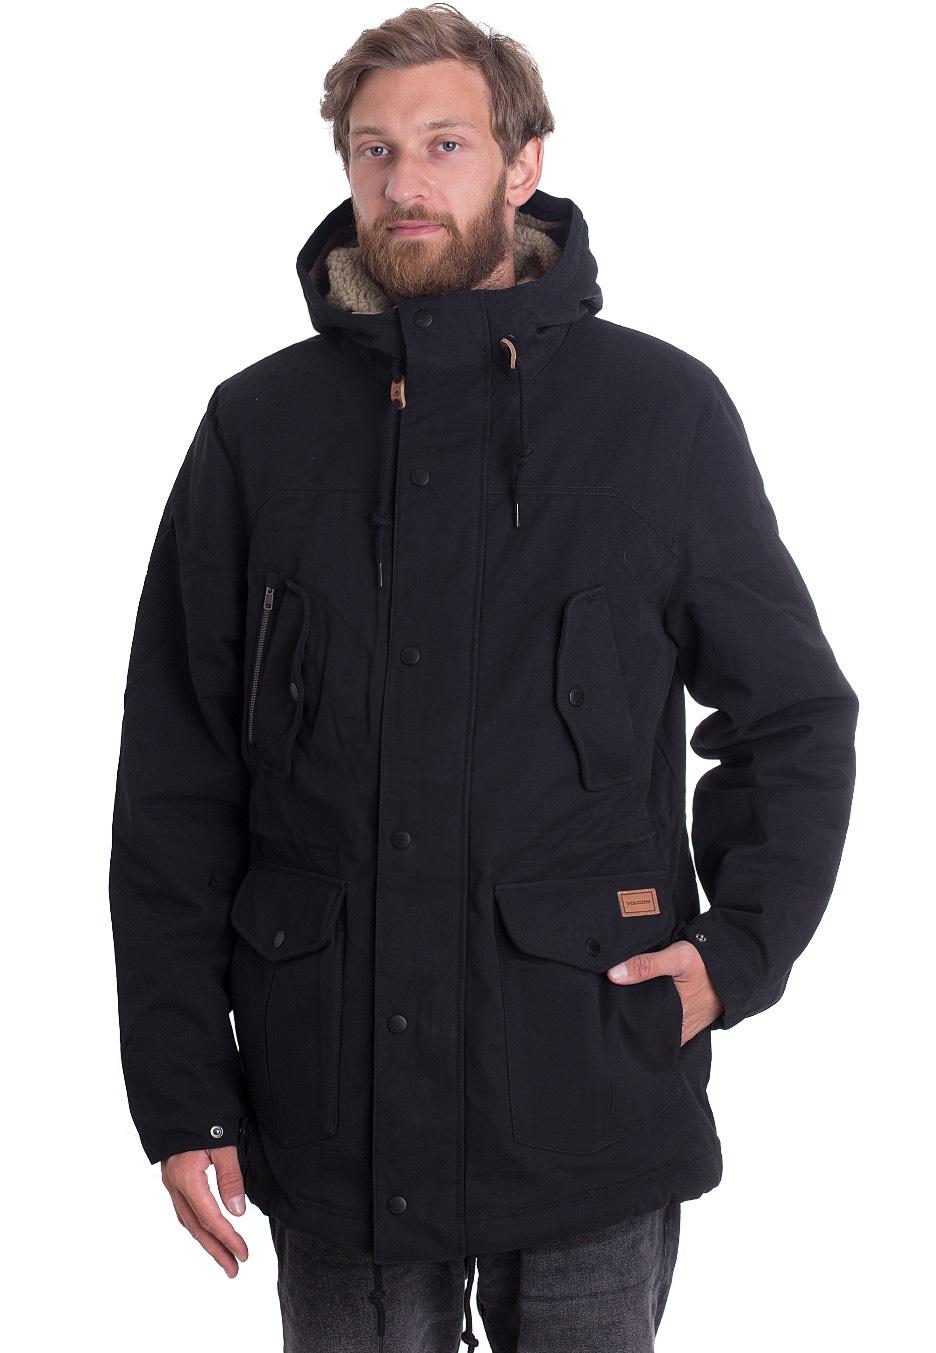 aca09b87c42c Volcom - Starget Parka - Jacket - Streetwear Shop - Impericon.com Worldwide